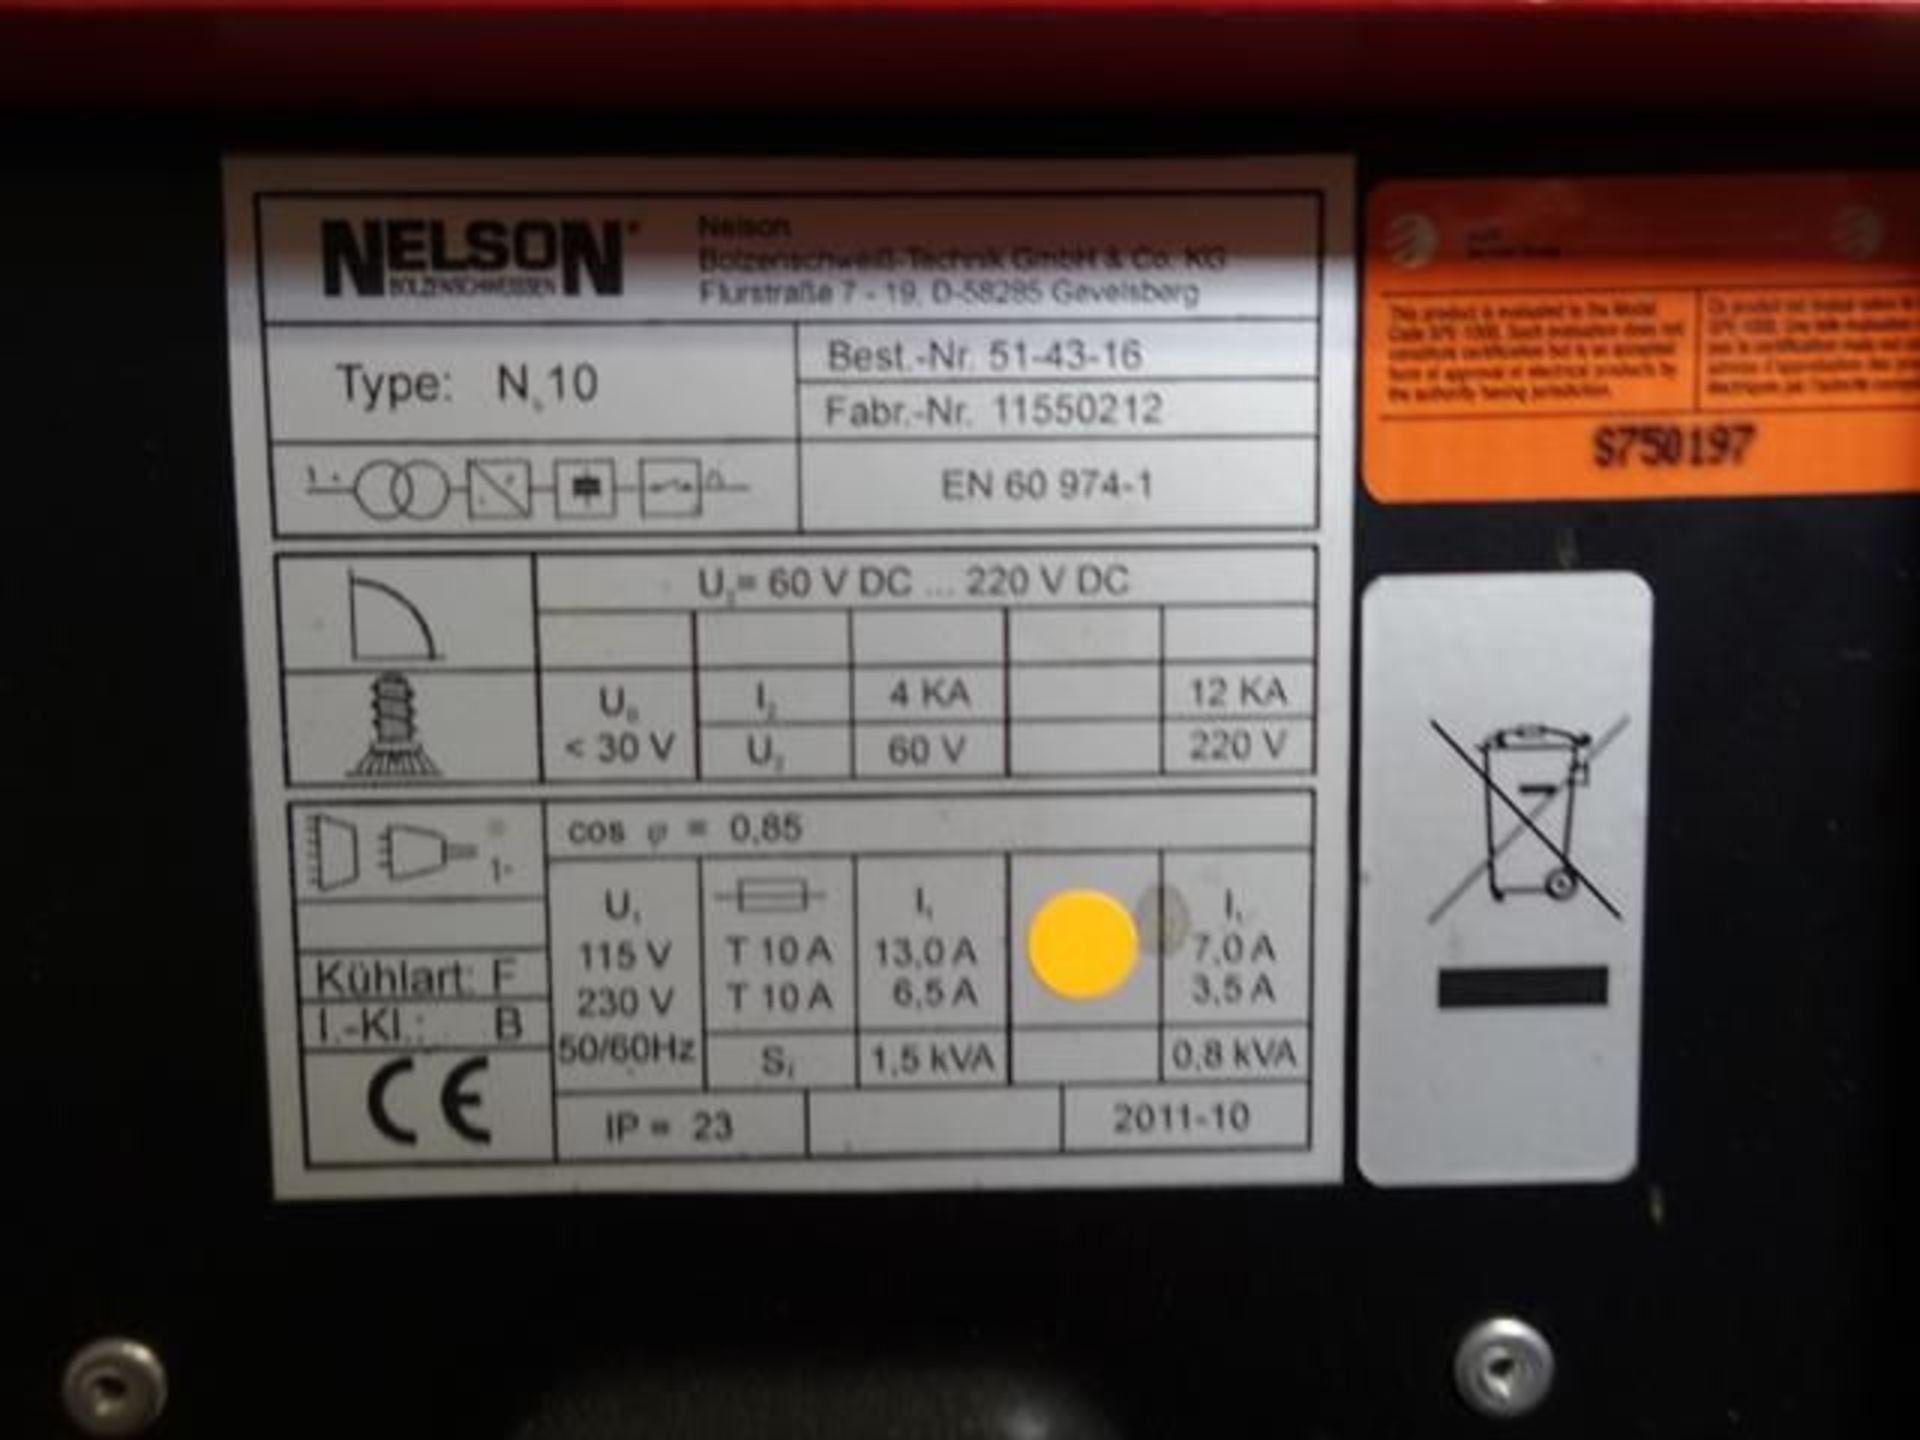 Lot 50B - NELSON, N10, CD LITE 1, STUD WELDER, S/N 51-43-16